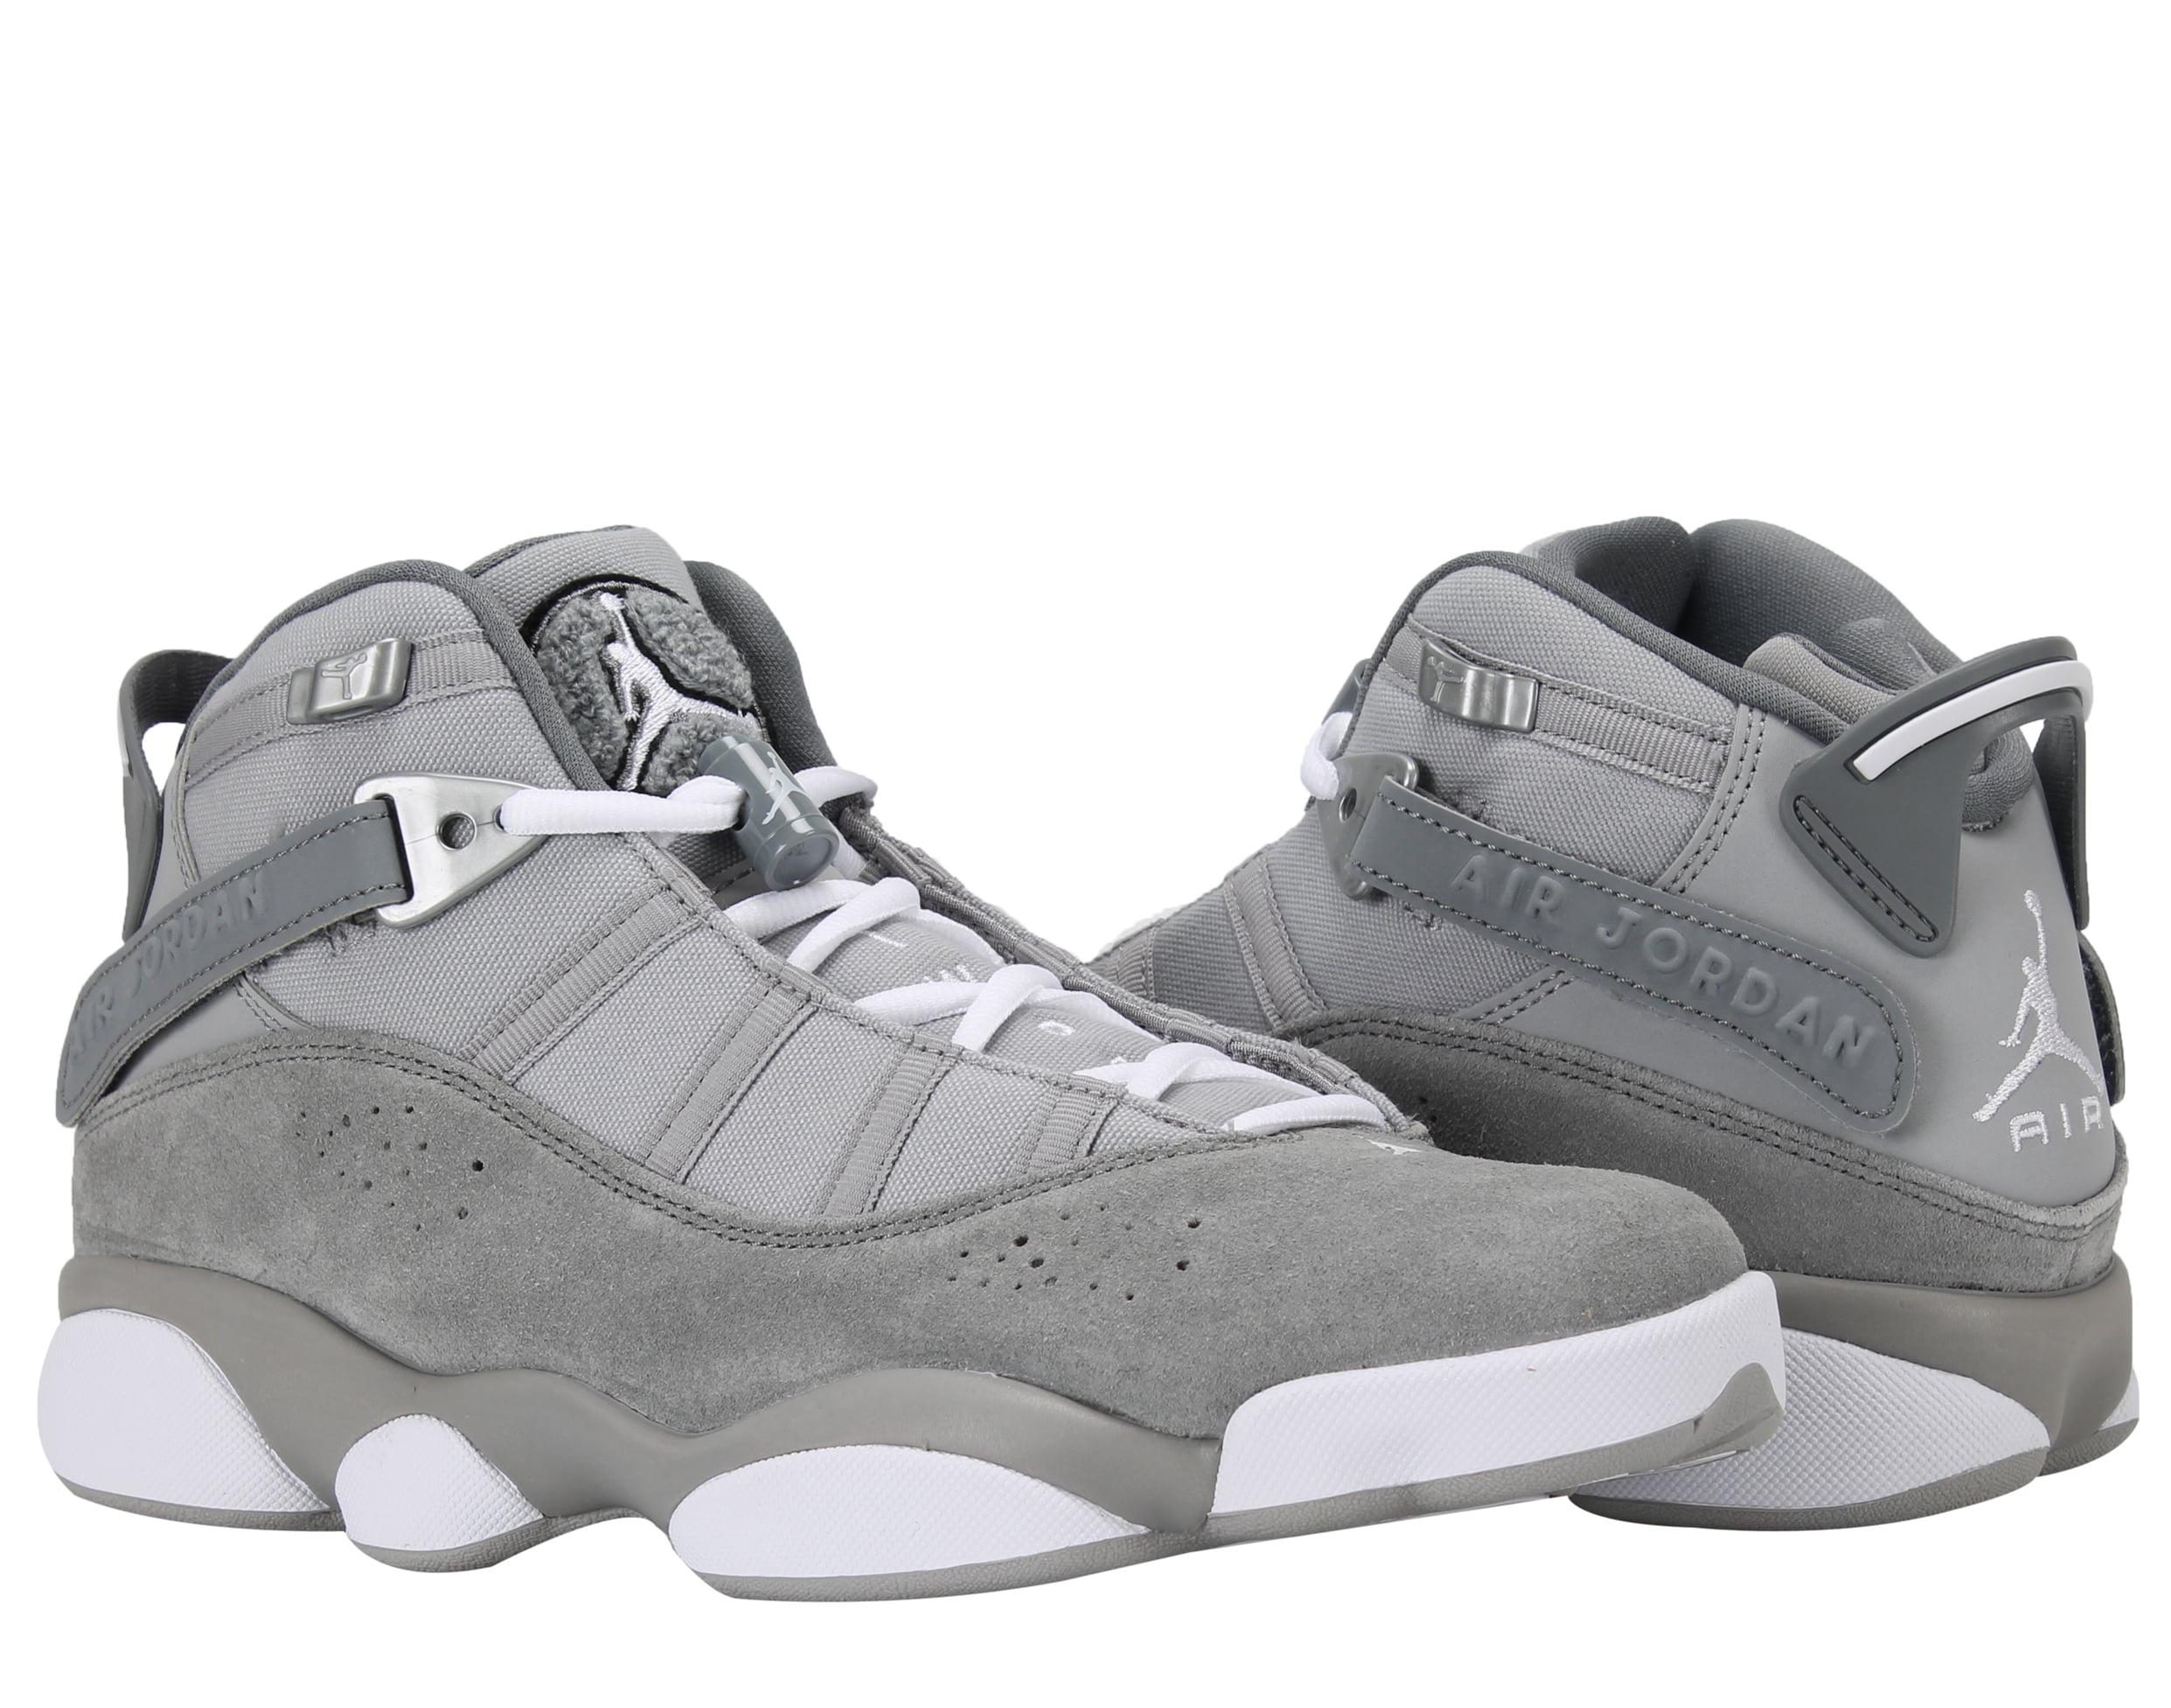 best service 945e8 8c0fa ... where can i buy jordan nike air jordan 6 rings silver white grey mens  basketball shoes